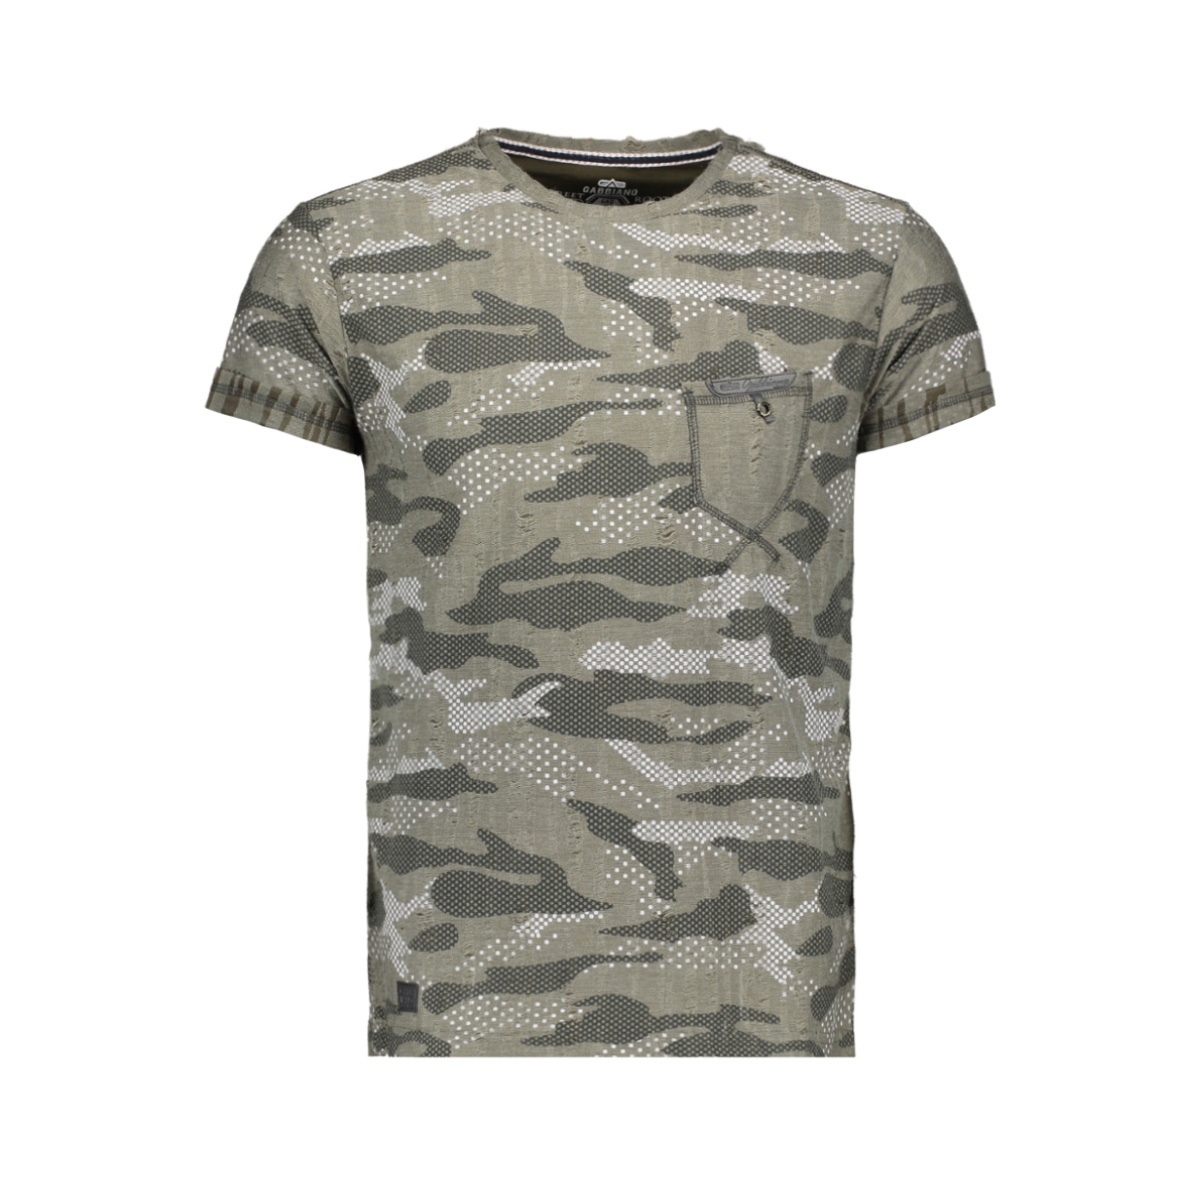 t shirt 13830 gabbiano t-shirt army